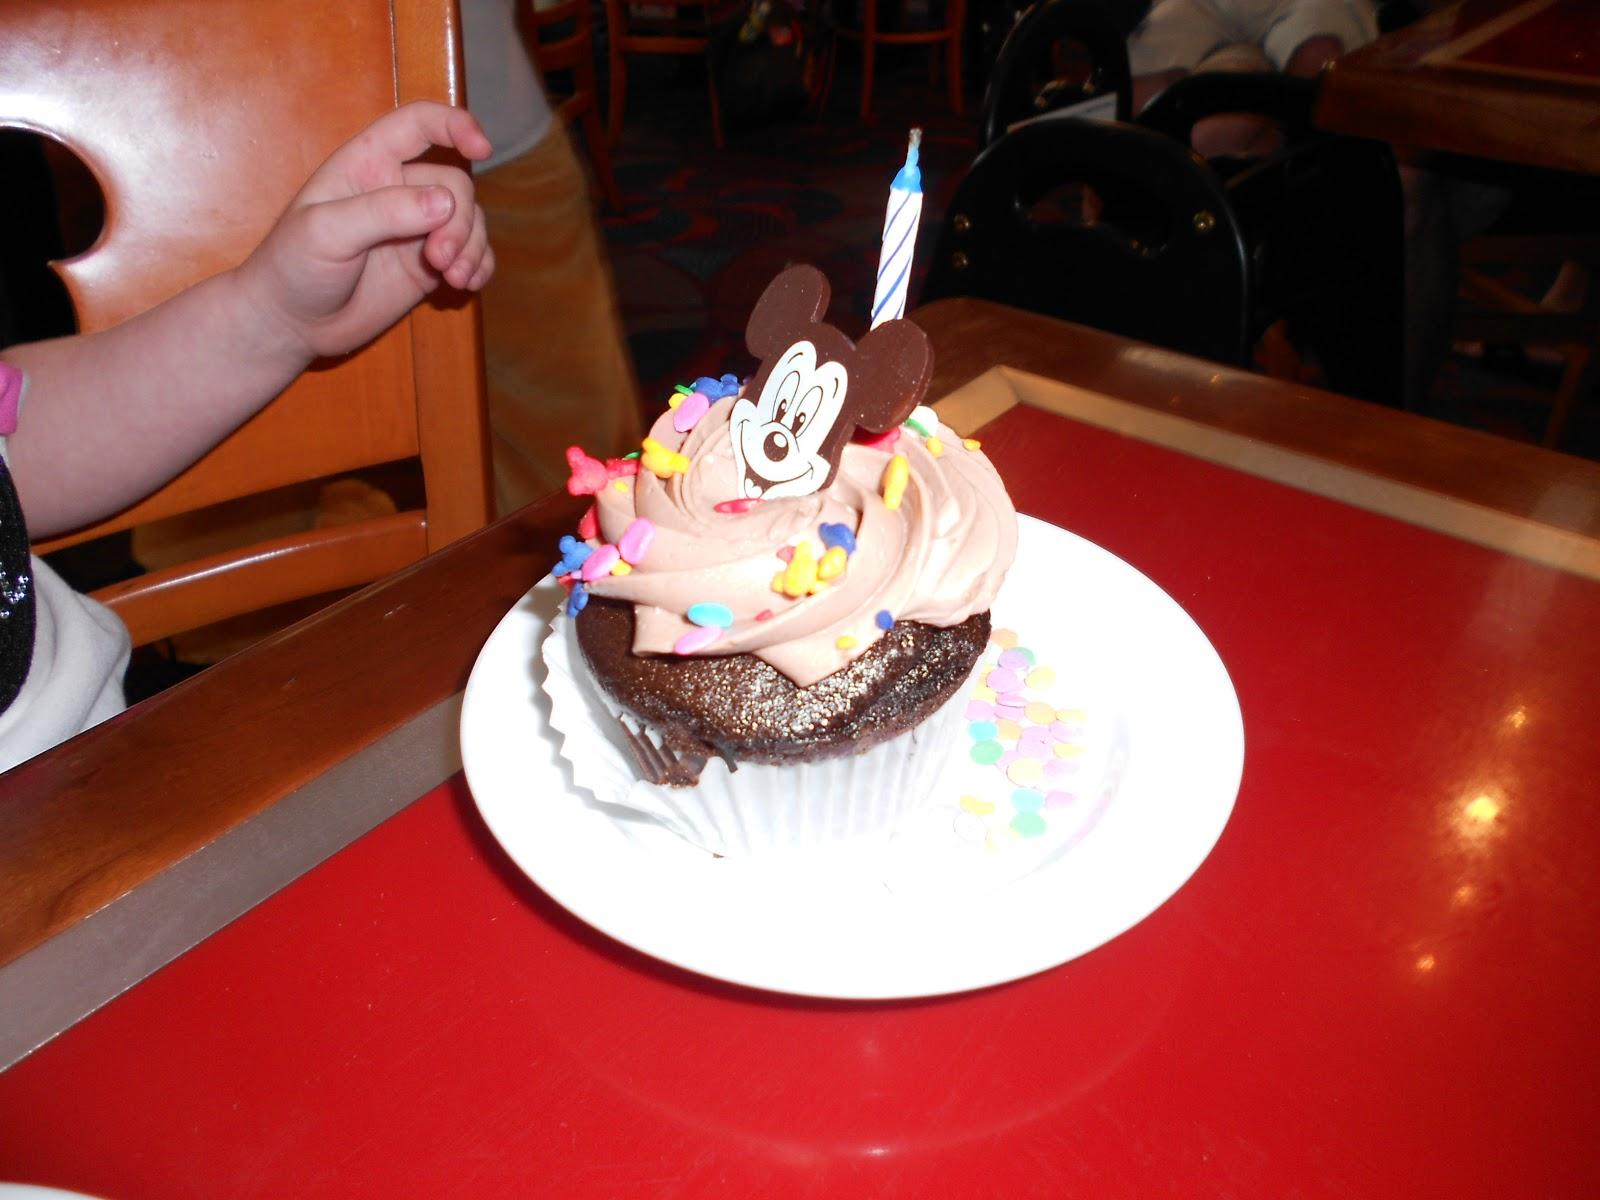 Celebrating A Birthday At Disney World Tips From The Disney Divas